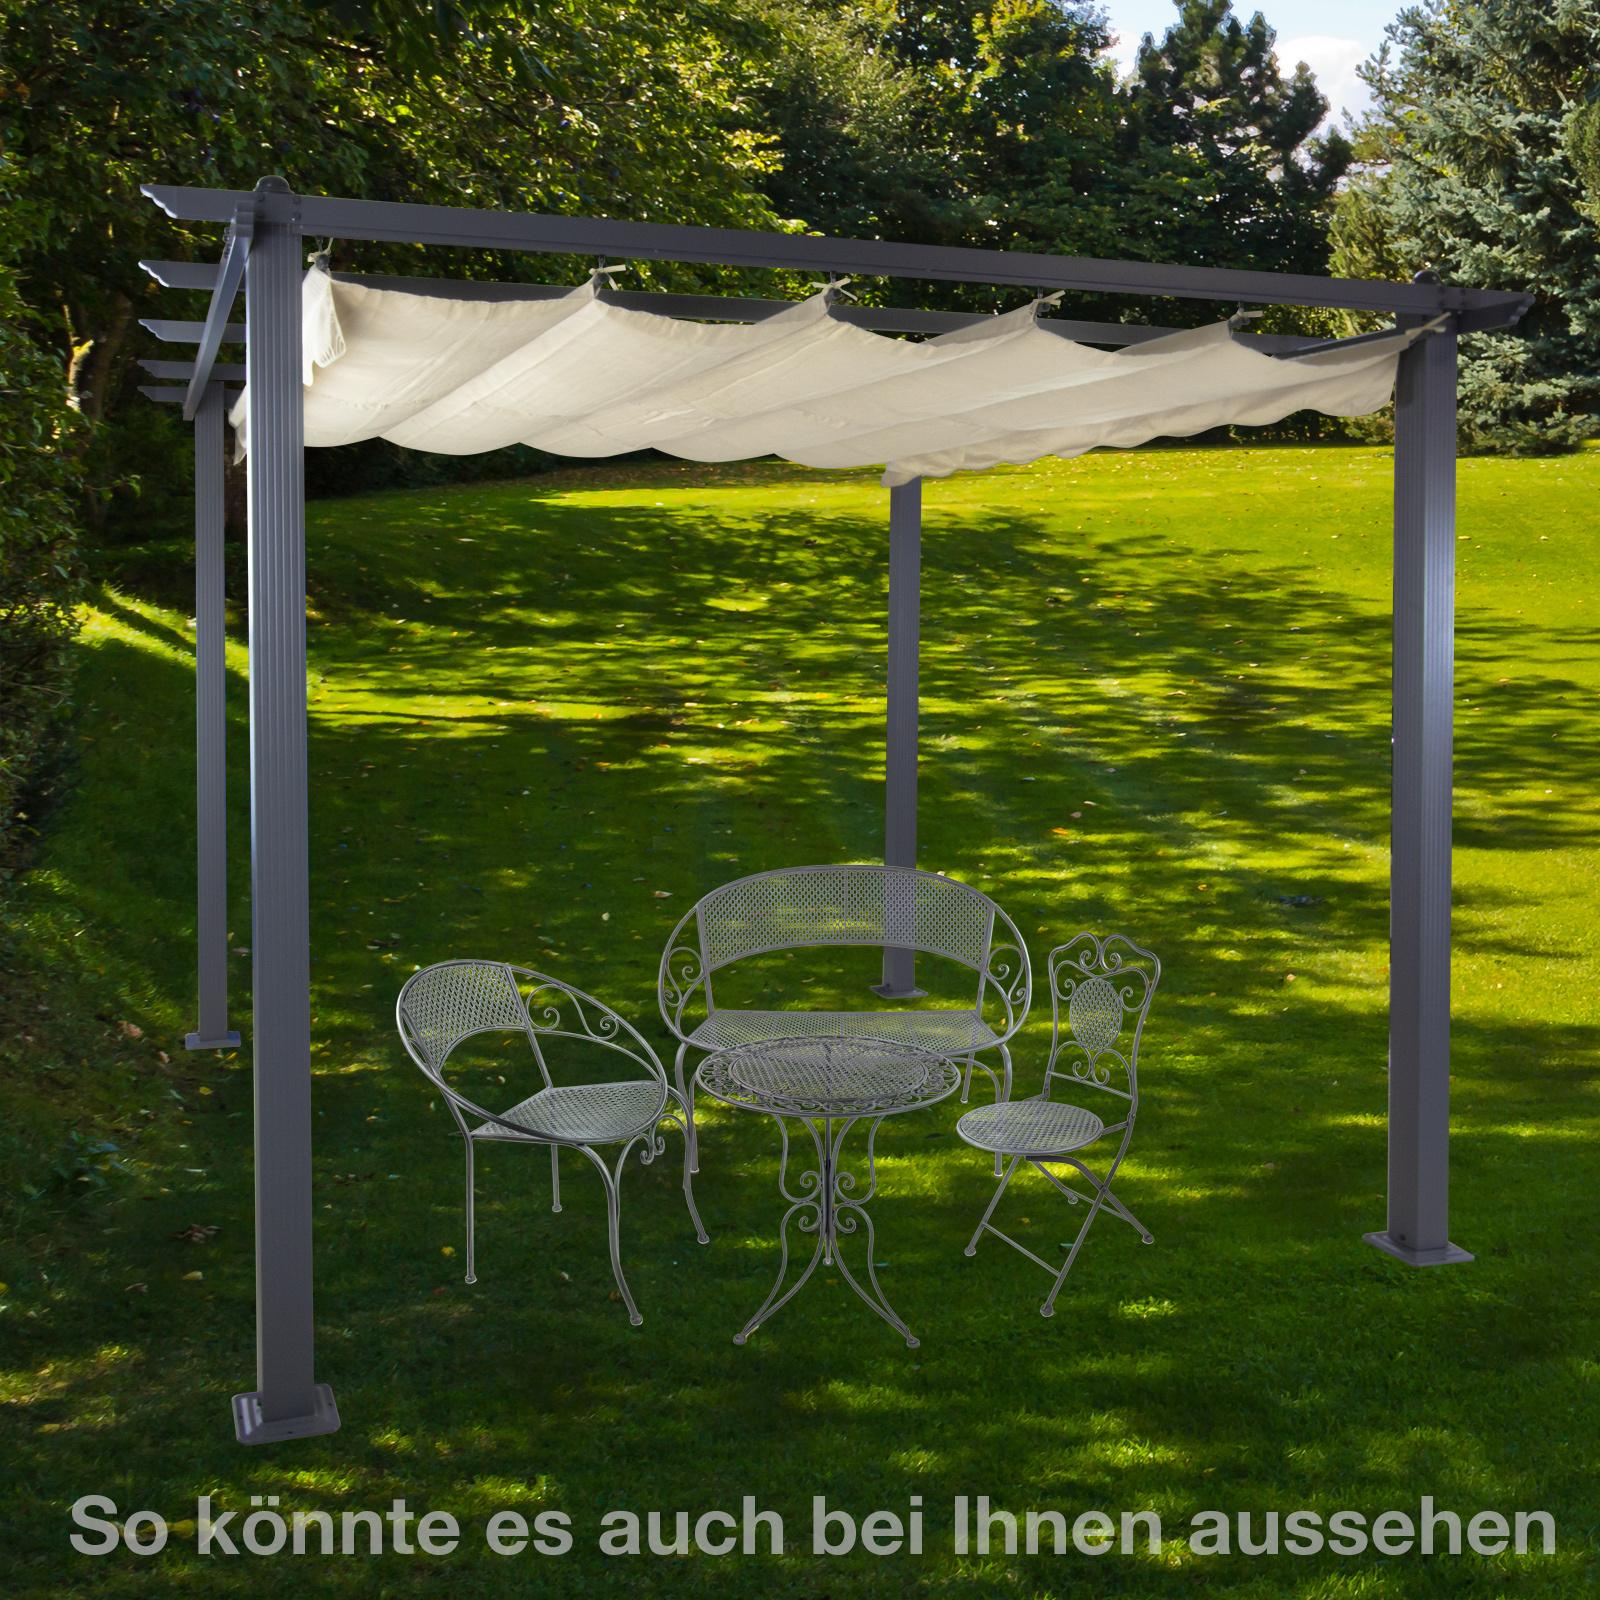 alu pergola sonnenschutz berdachung freiburg ecru mit sonnendach 296x296 cm ebay. Black Bedroom Furniture Sets. Home Design Ideas